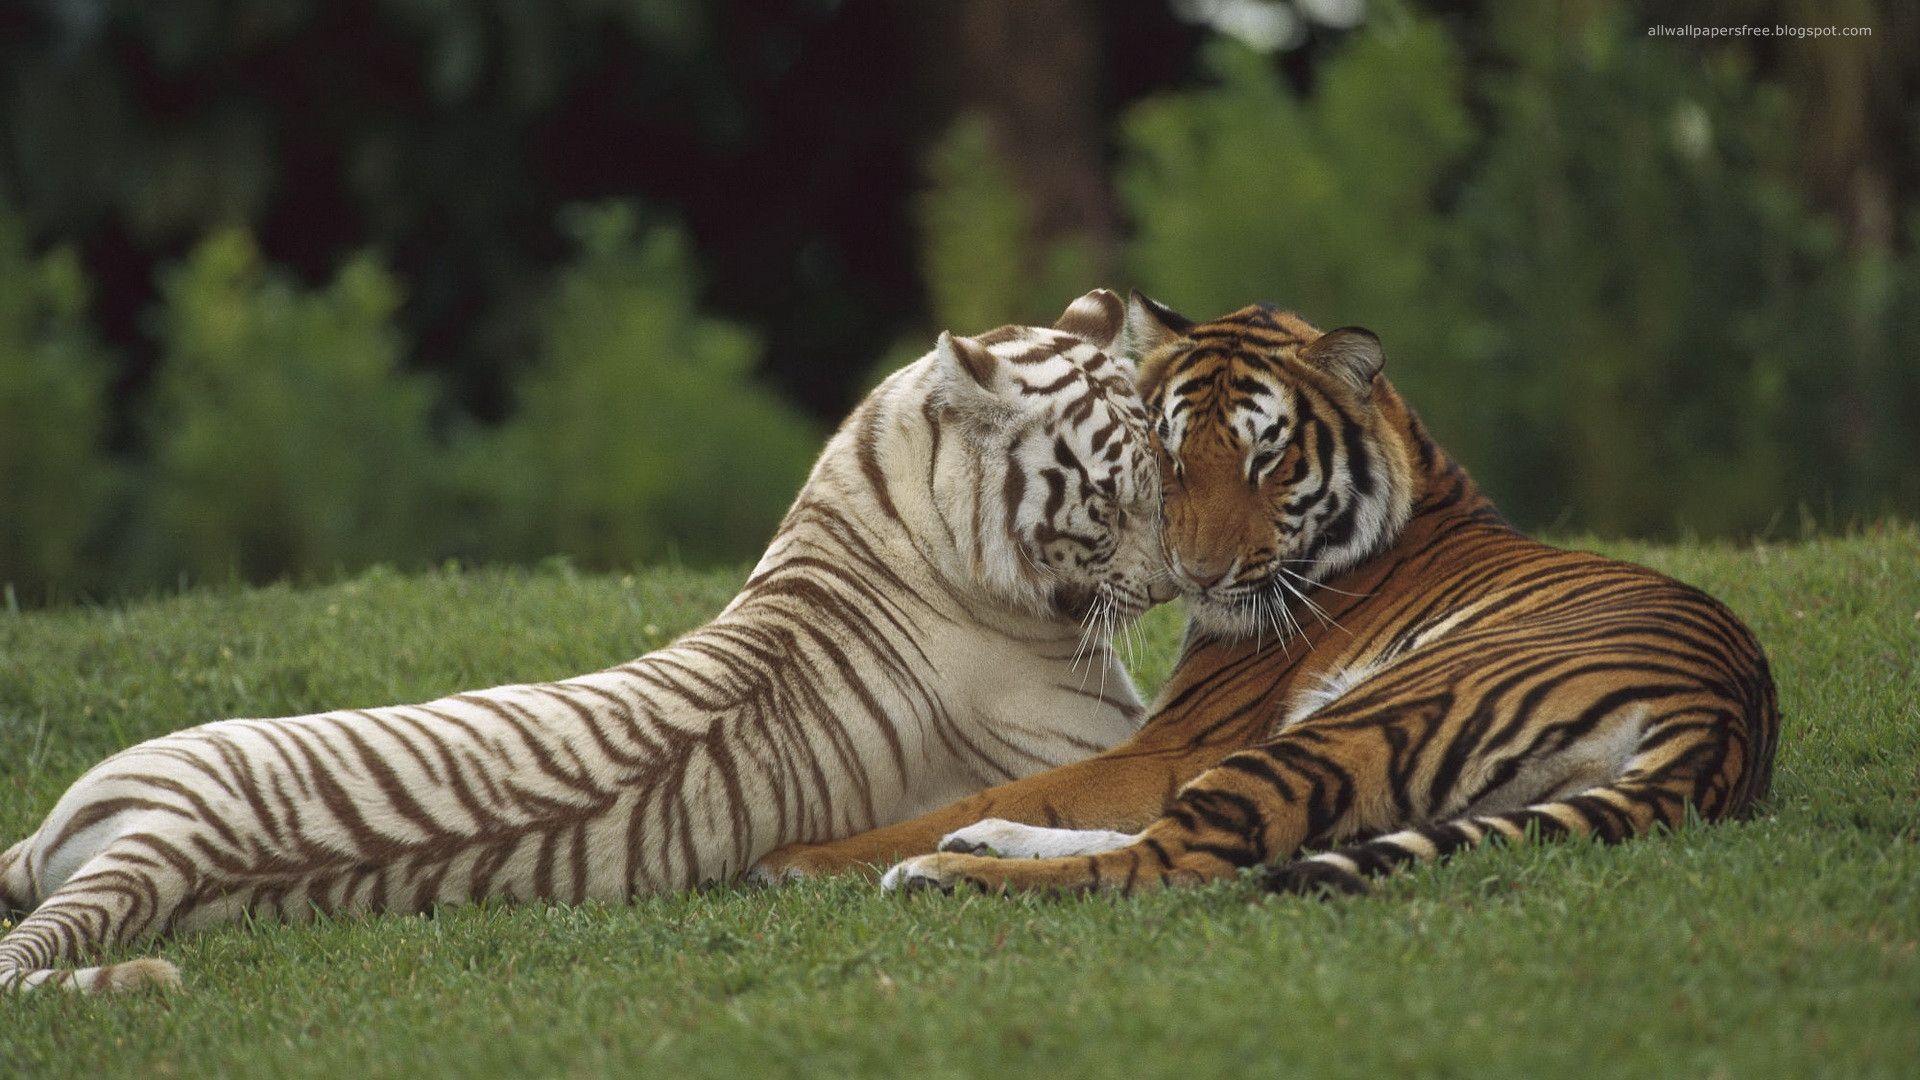 Interracial lovin [SFW] Our Beautiful World Tiger wallpaper 1920x1080